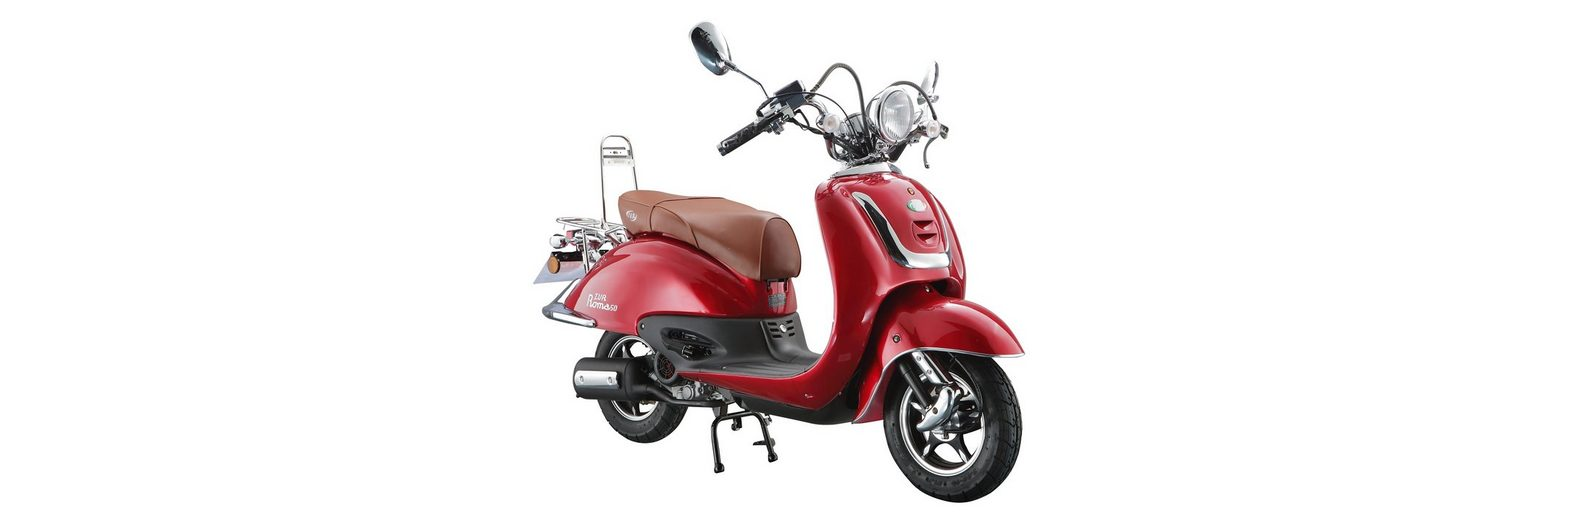 Retro-Motorroller »RETRO ROMA«, 50 ccm 45 km/h, für 2 Personen, rot/braun